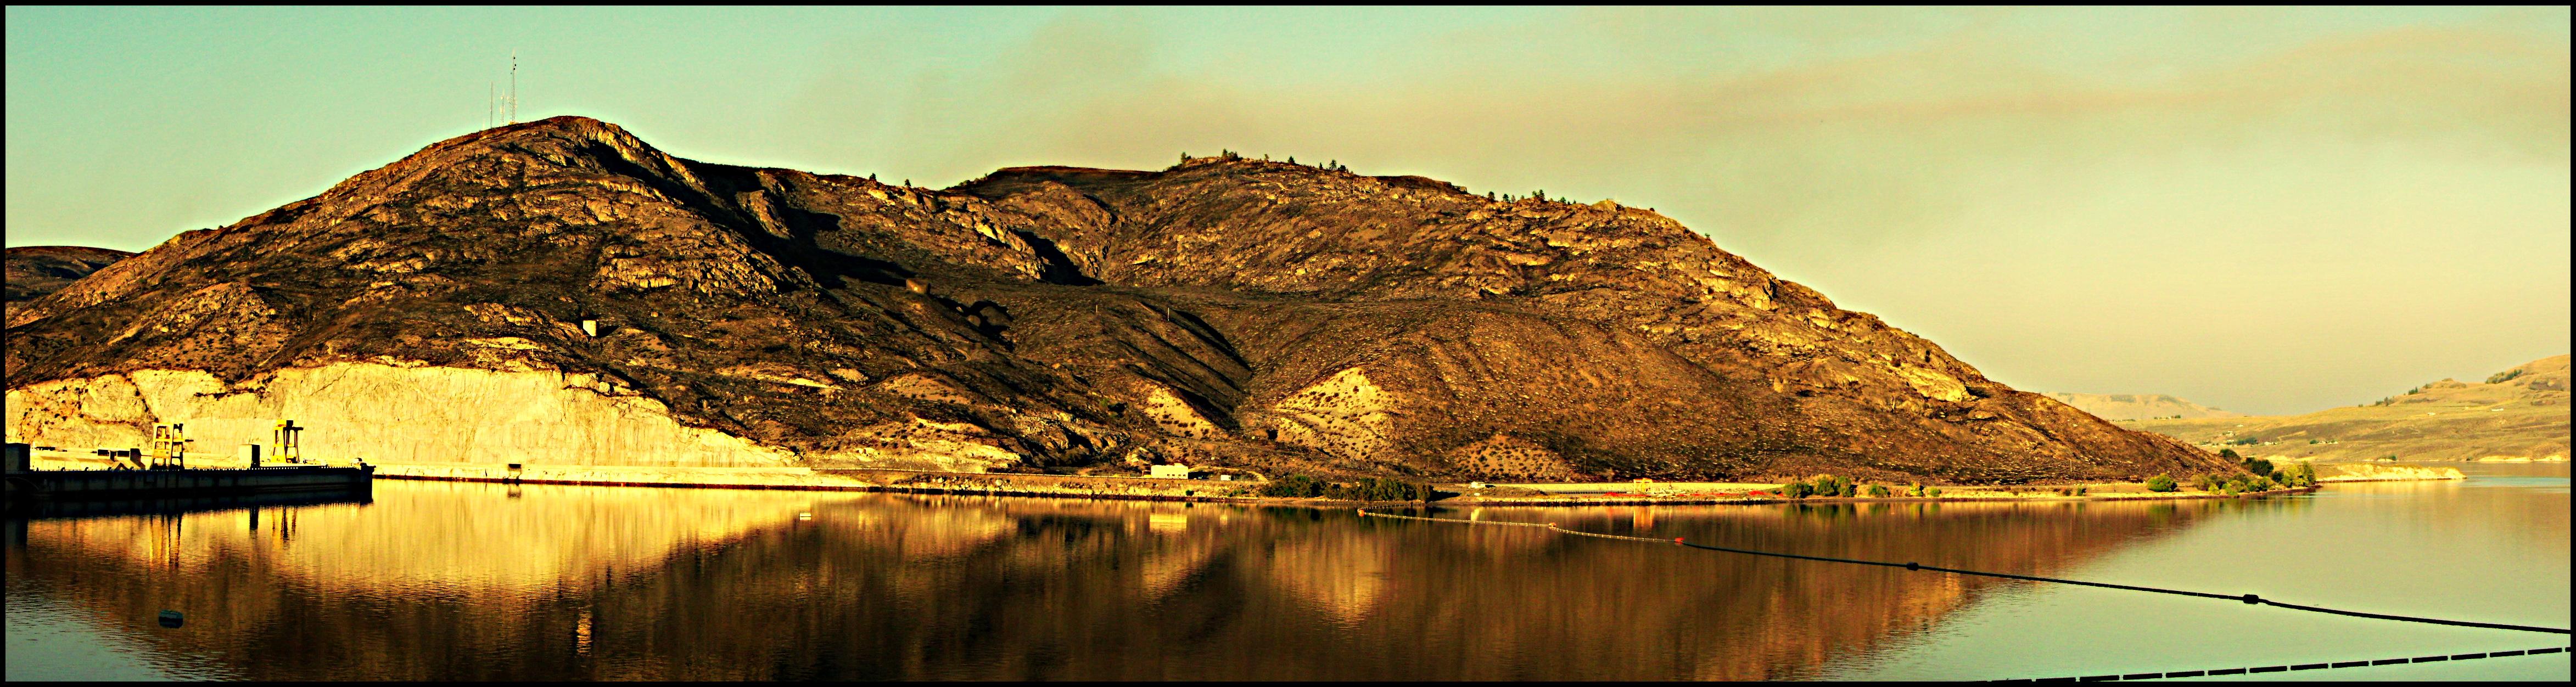 Grand Coulee Dam 2 by crimsonravenwarrior